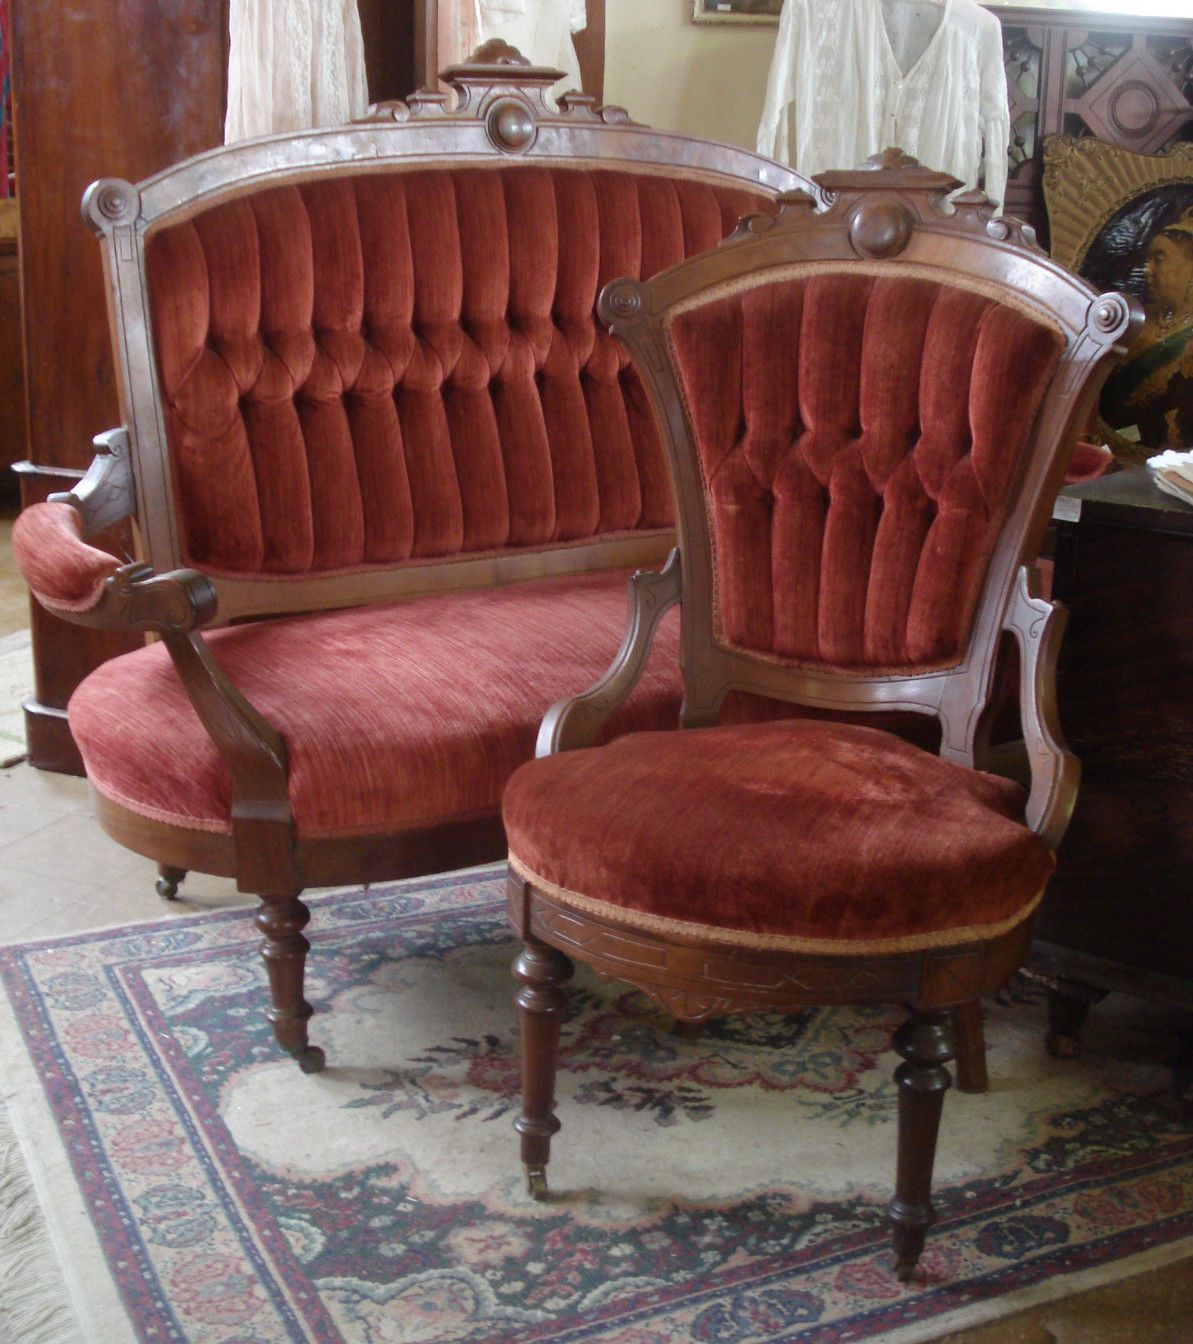 Victorian Style Chair Covers Room Hammock Antique 1870s Eastlake Walnut Burl Sofa